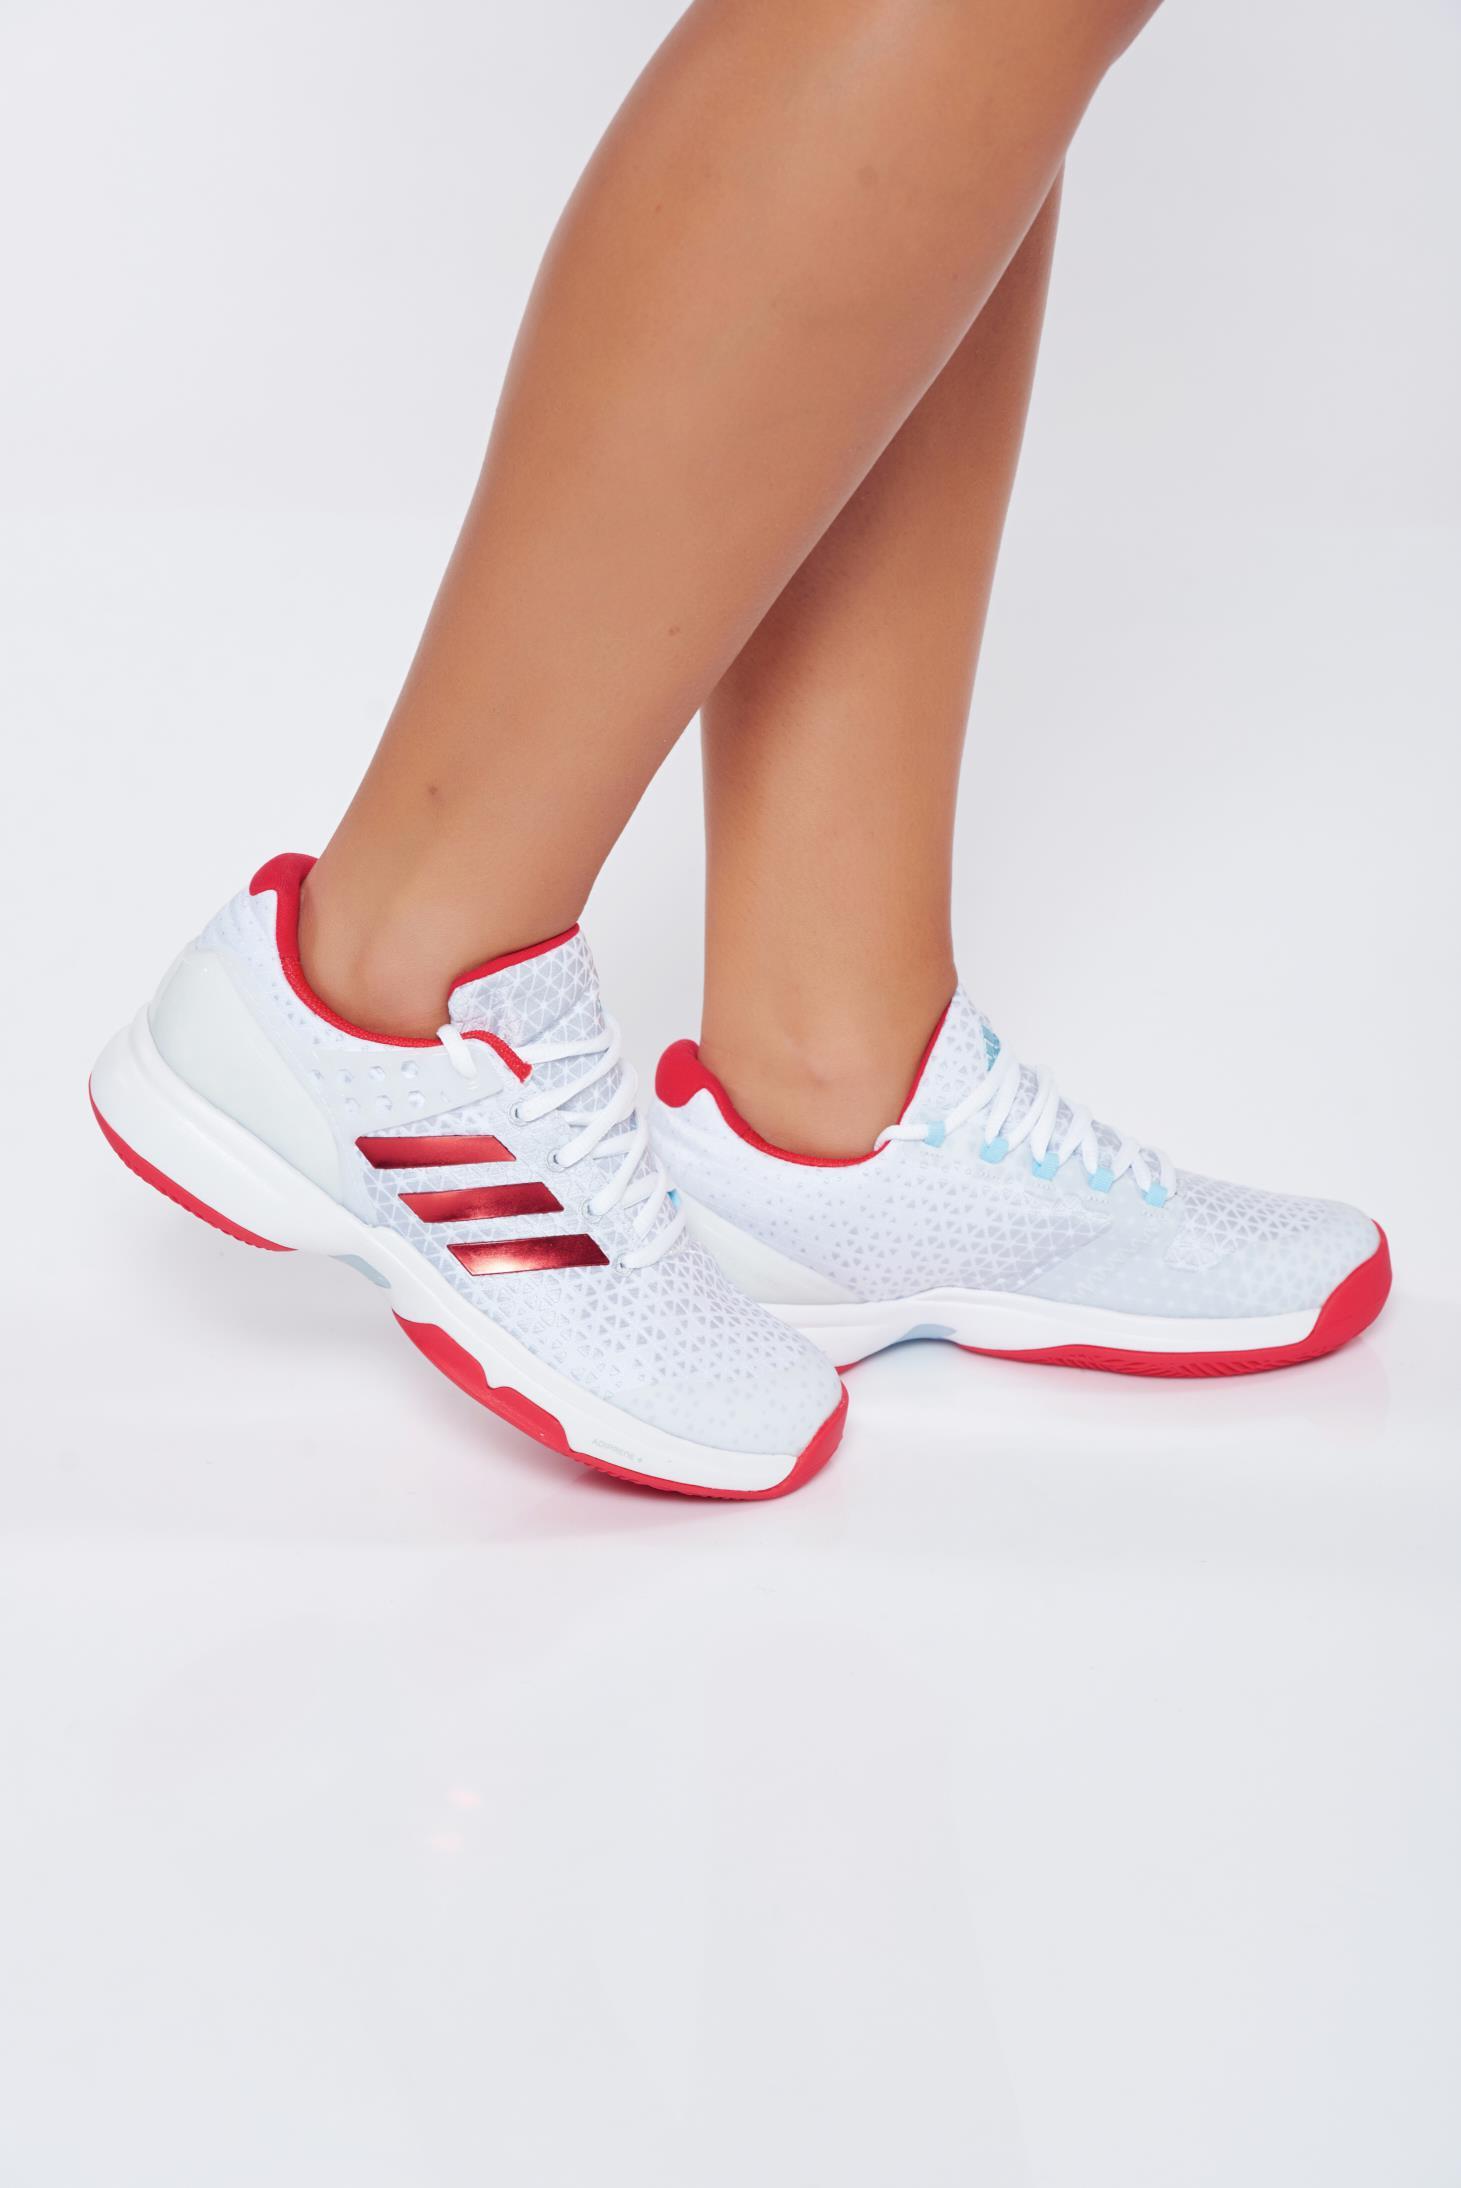 bcc6bb3385 Fehér Adidas hétköznapi sport cipő lapos talpú műbőr